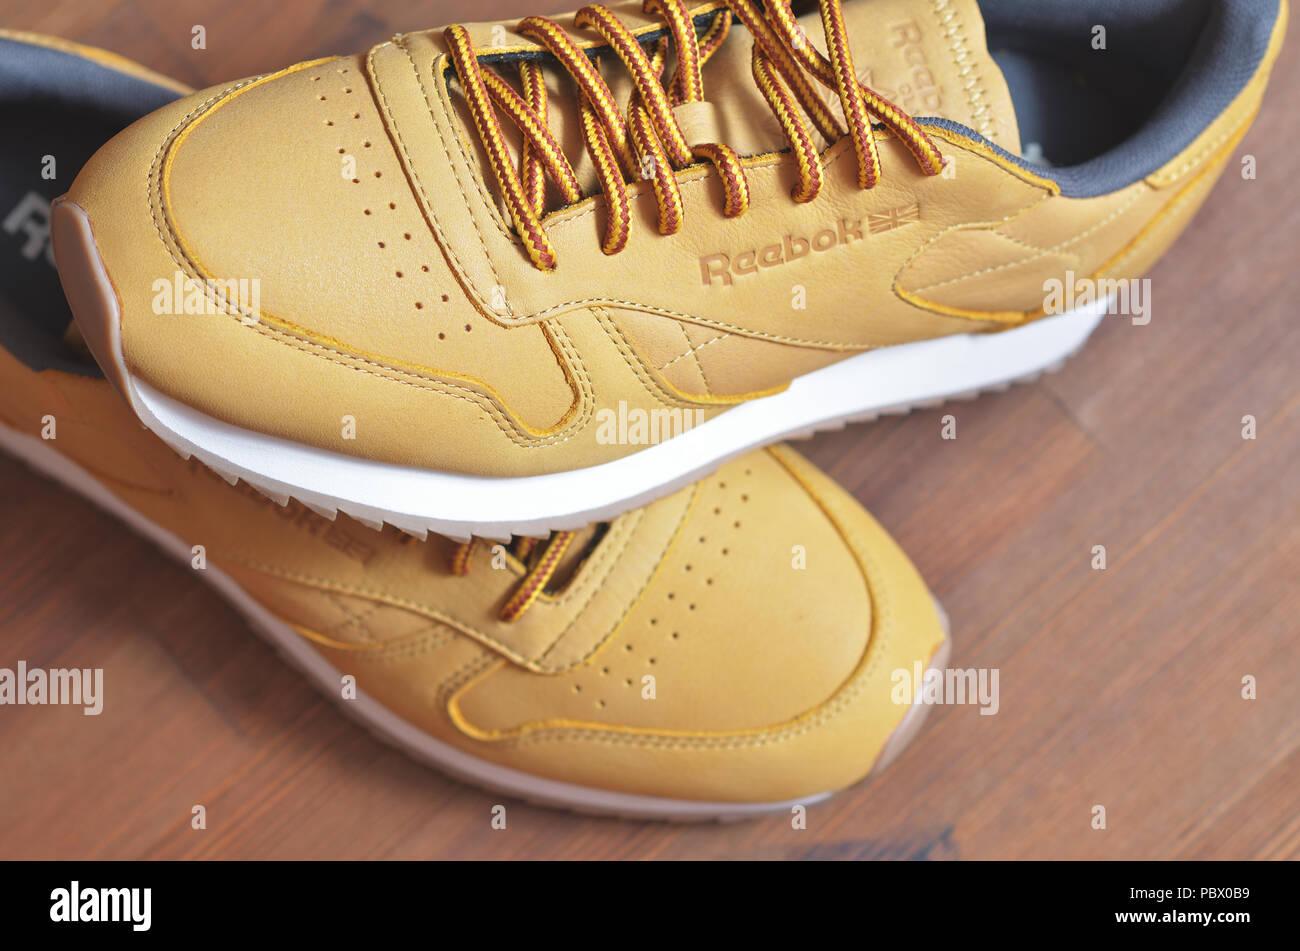 0152e9ab Kiev, Ukraine - May 30, 2018: Reebok sneakers are on the sneaker,